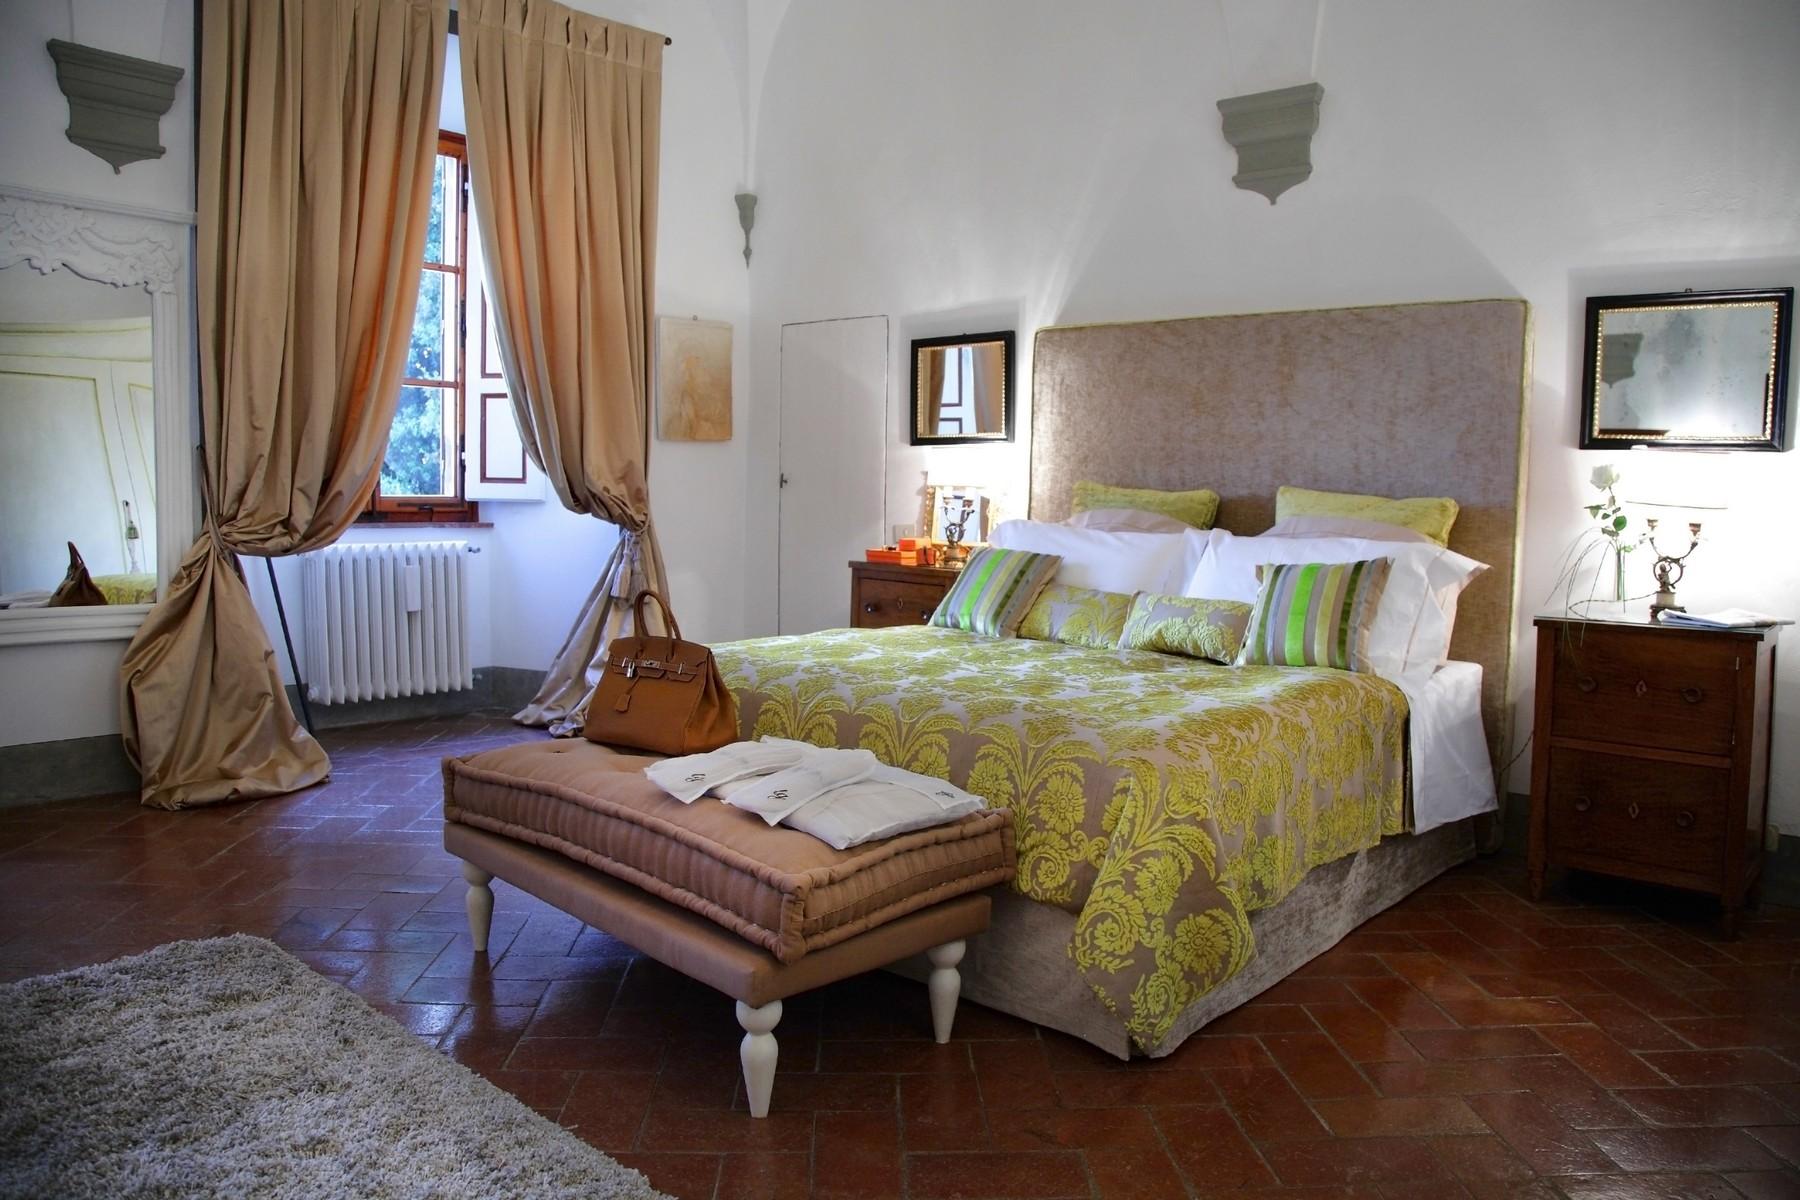 Villa in Vendita a Gaiole In Chianti: 5 locali, 4285 mq - Foto 9